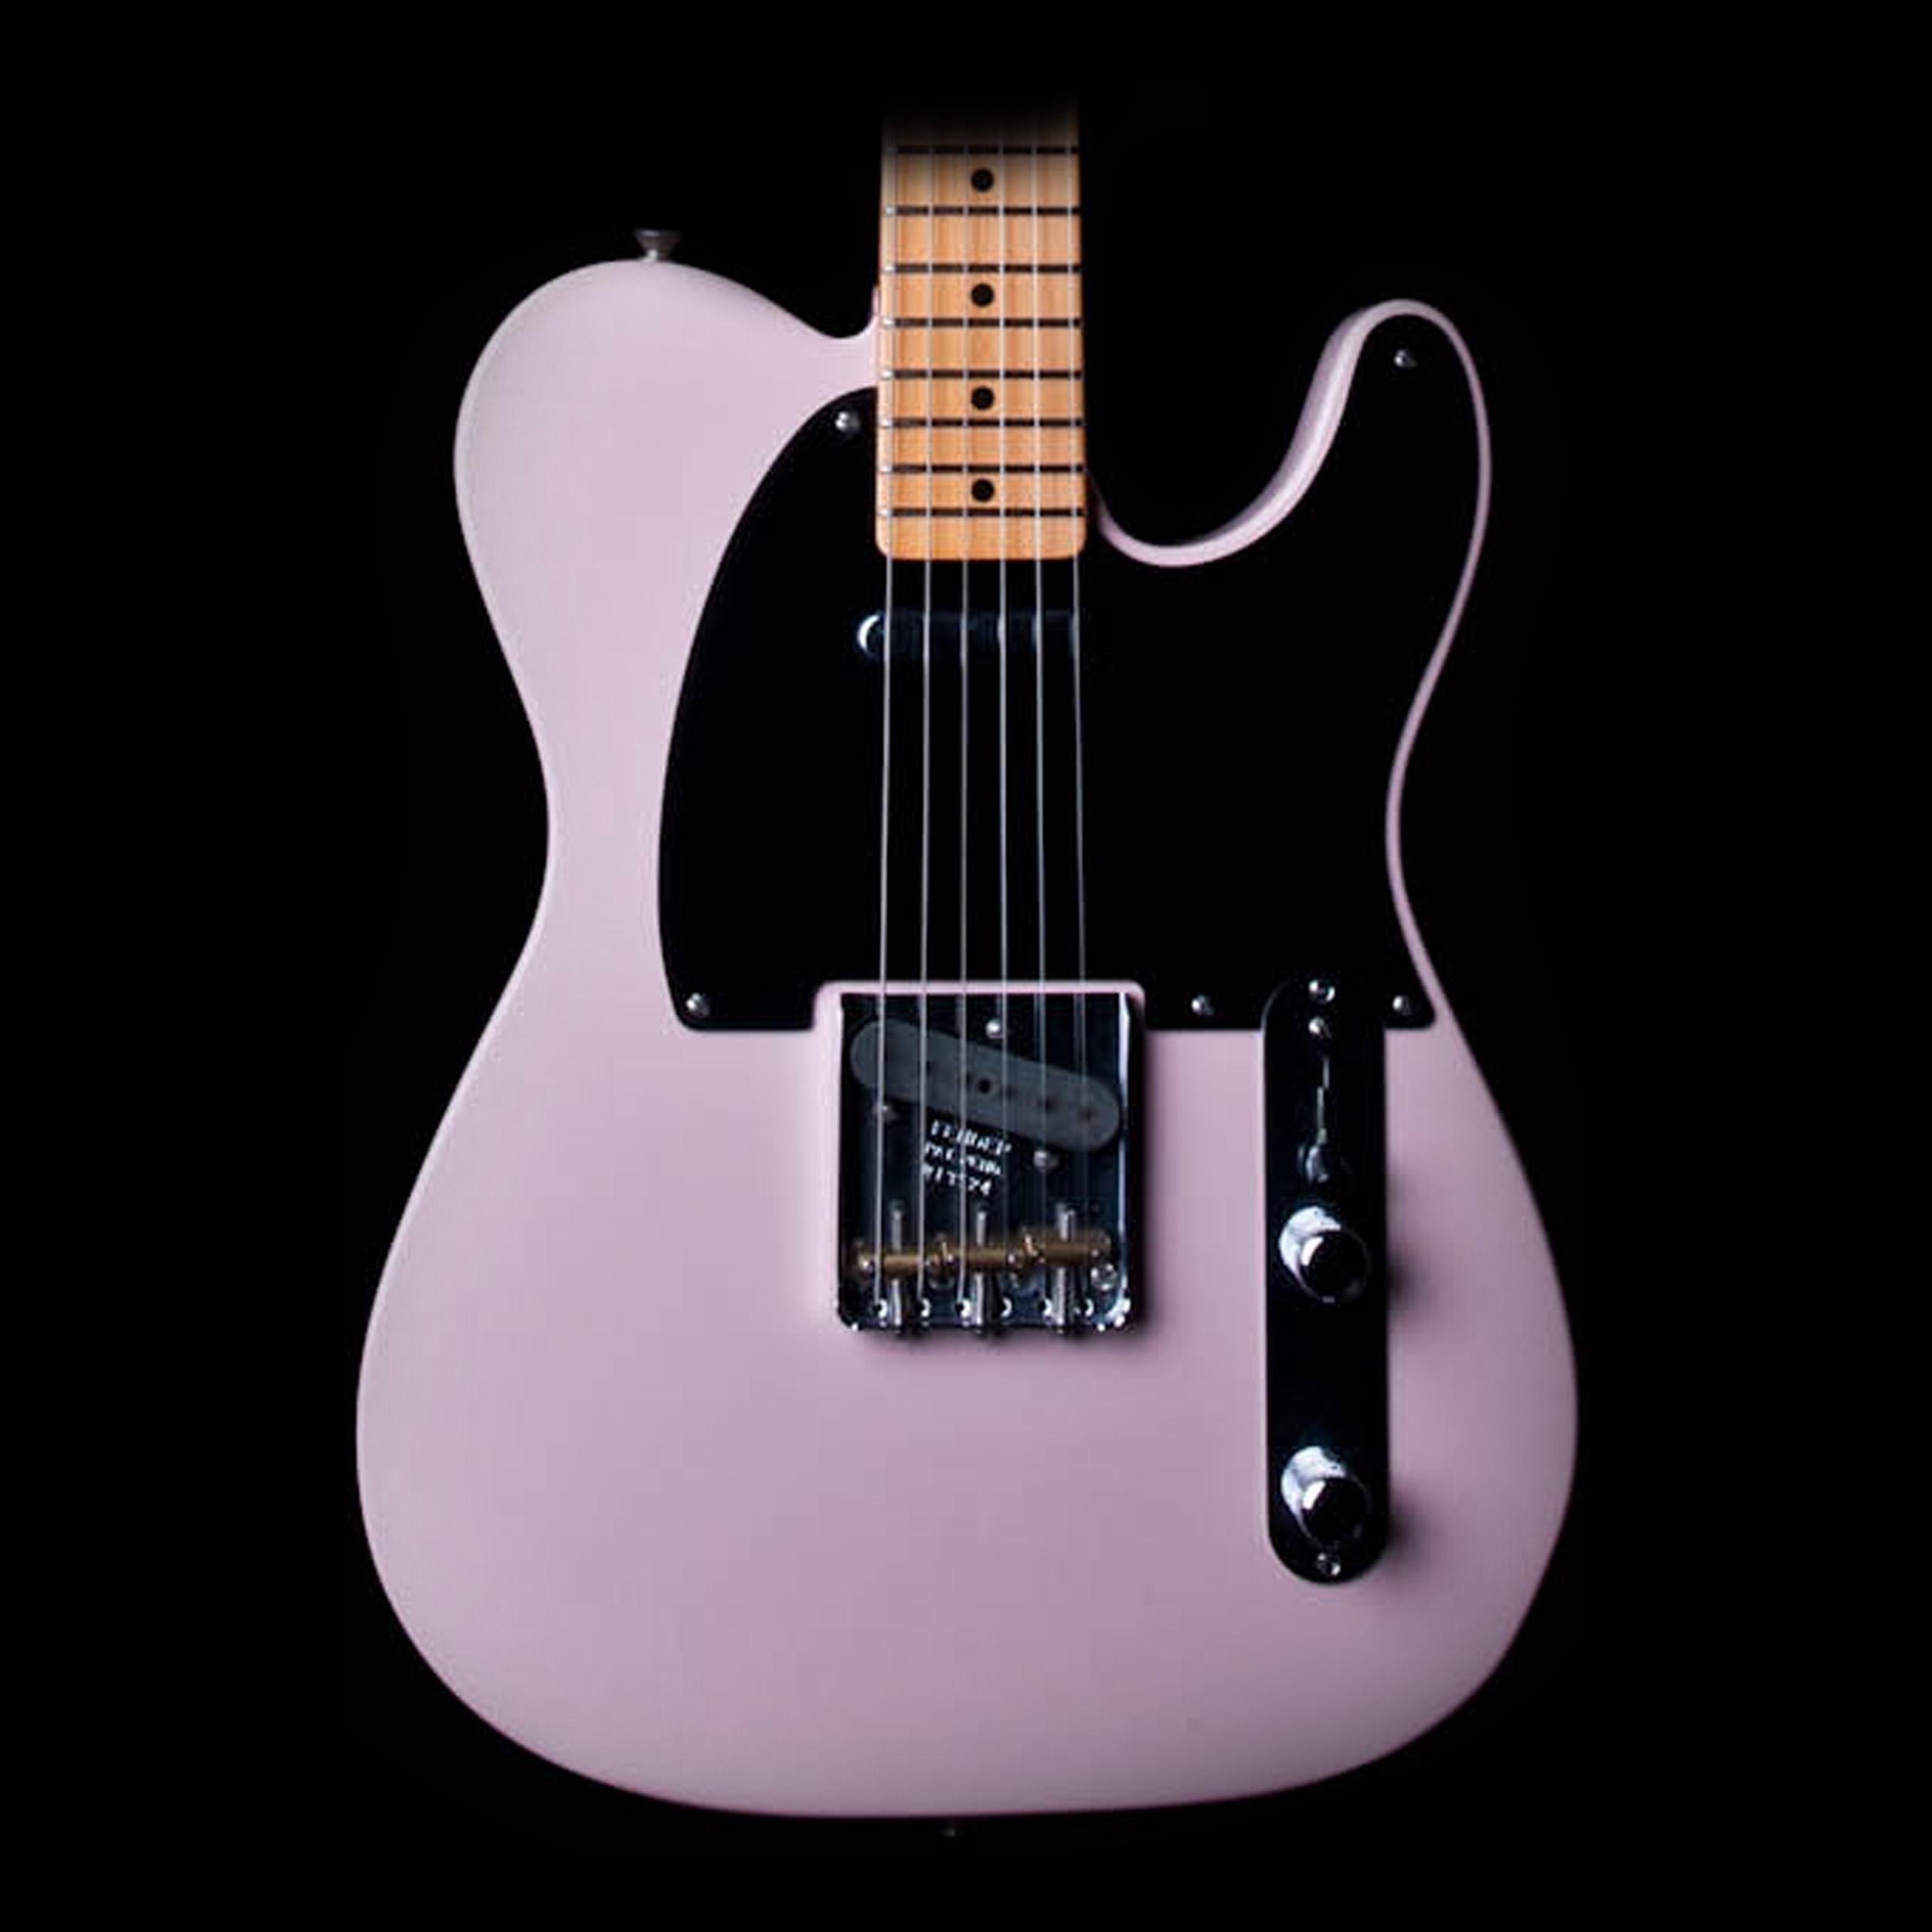 fender guitars 9230201856DIS 0 nocaster 4 way switch wiring diagrams data base